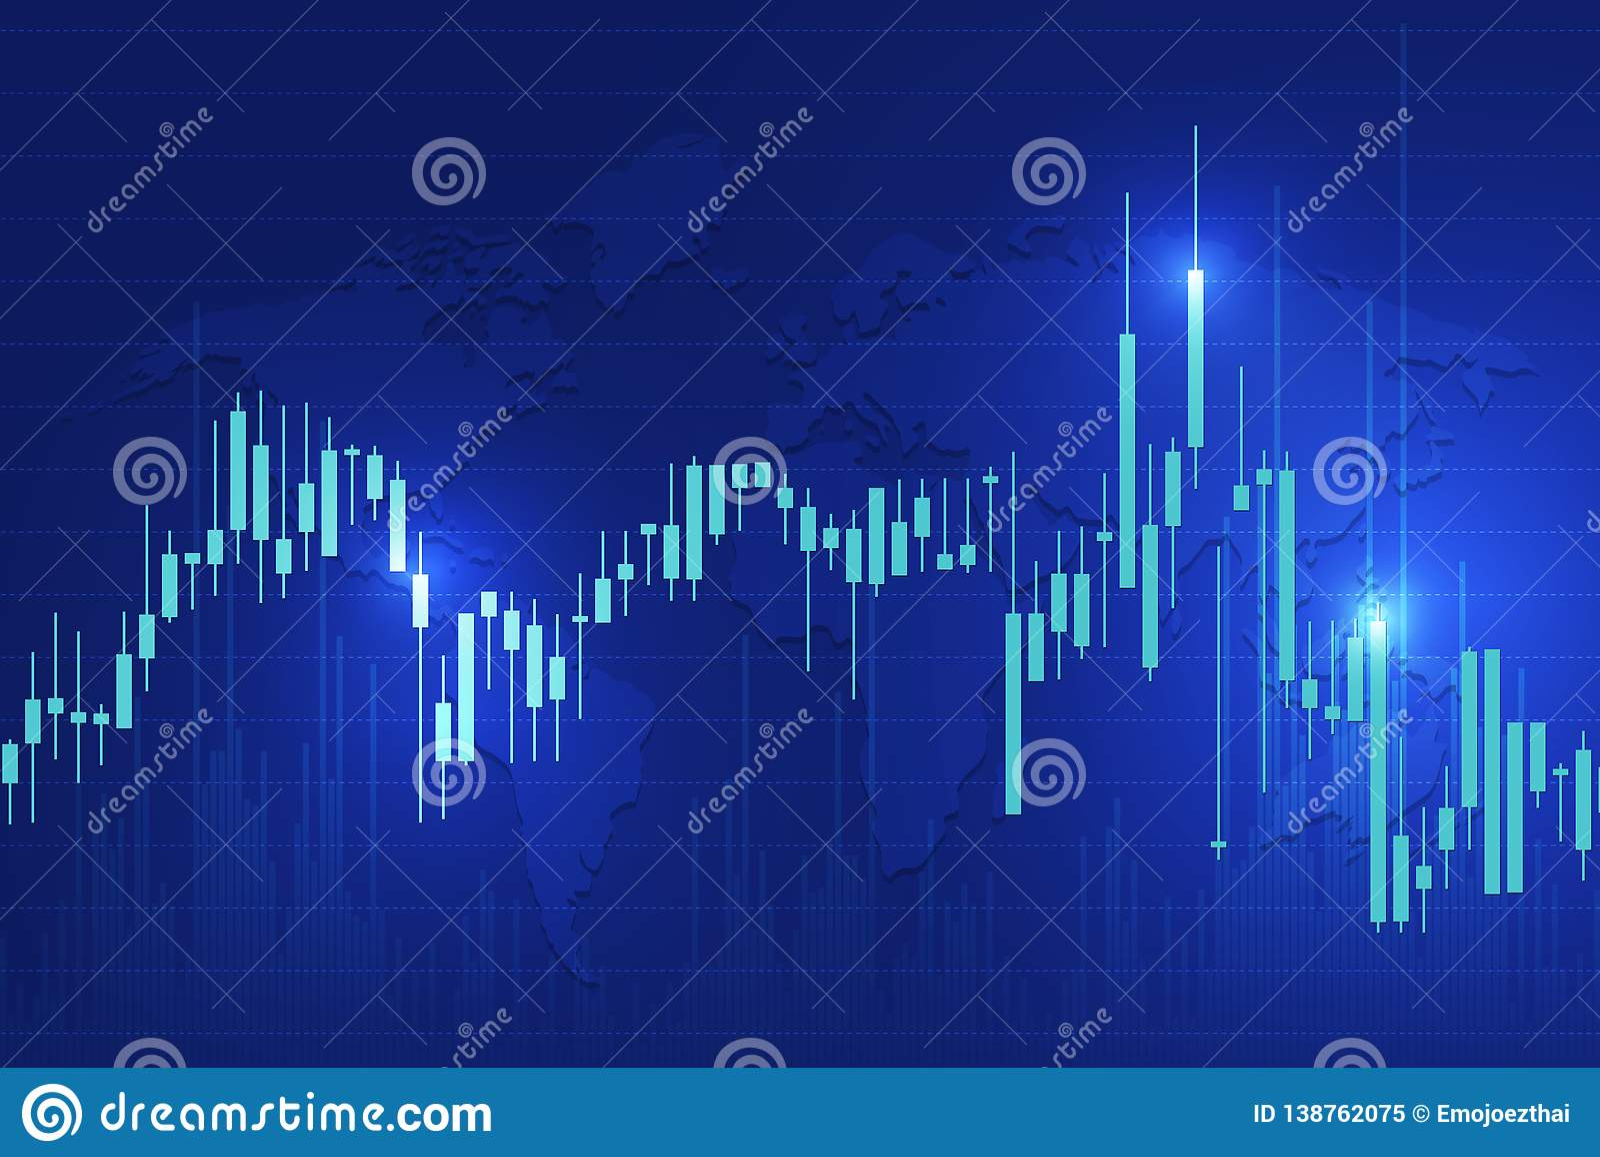 stock exchange background stock